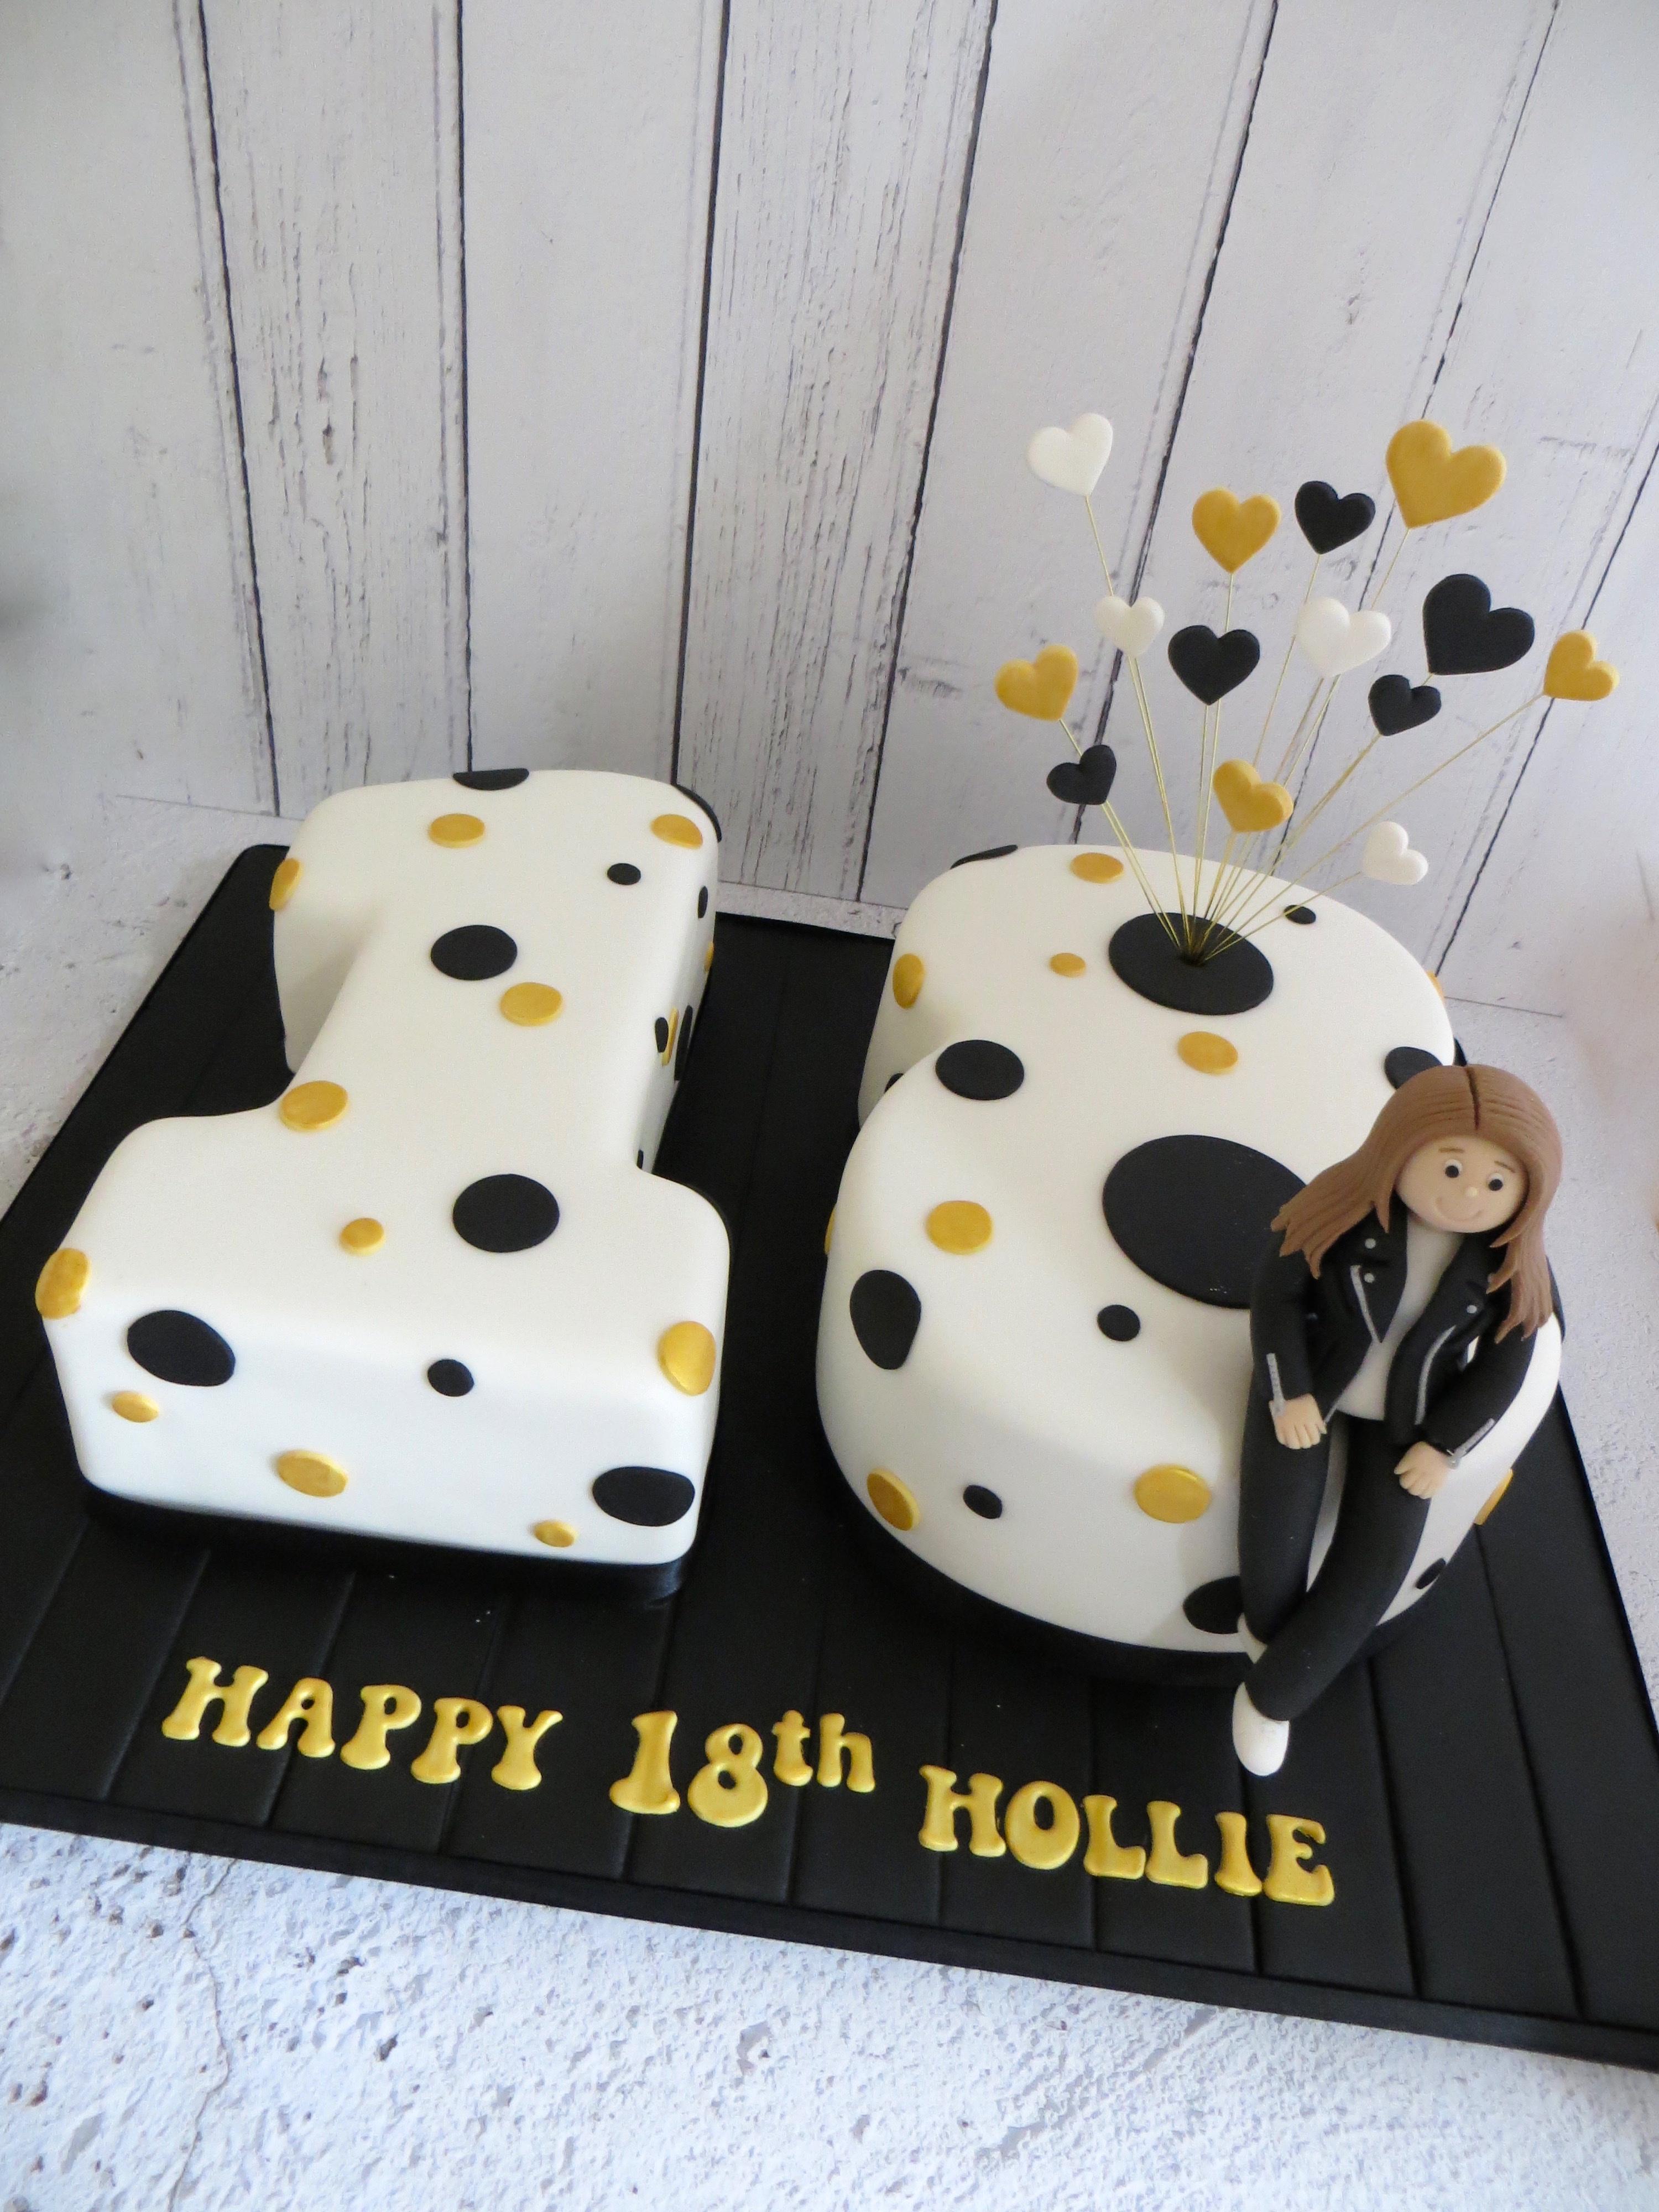 Stupendous 18Th Birthday Number Cake Funny Birthday Cards Online Inifodamsfinfo